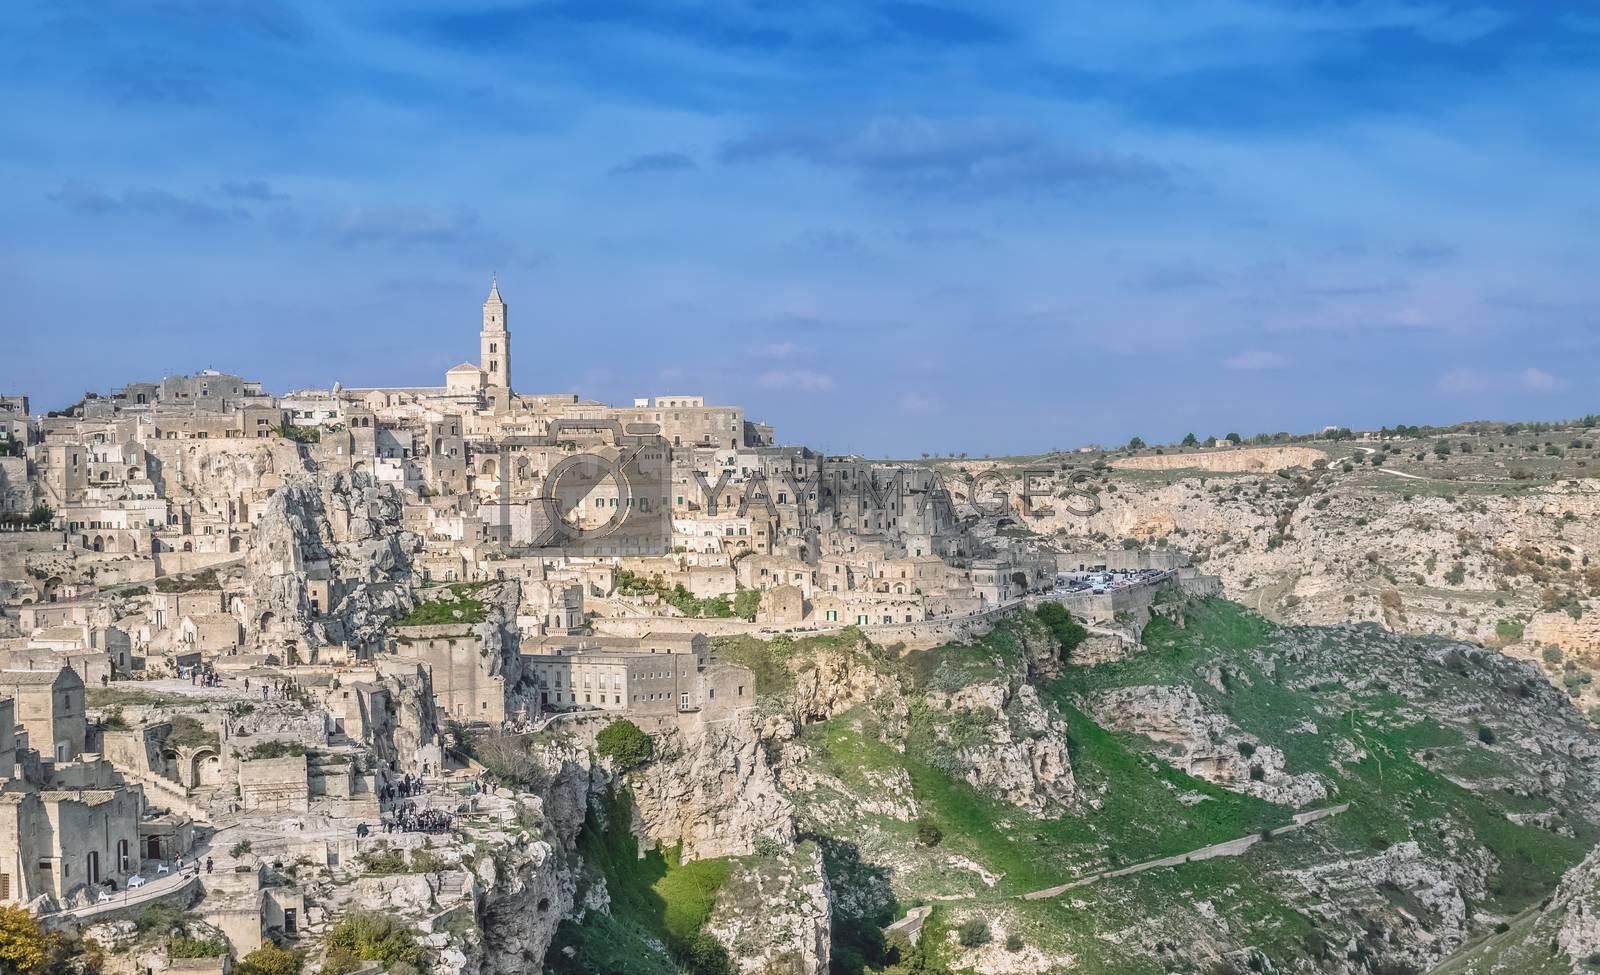 panoramic view of typical stones (Sassi di Matera) and church near gravina of Matera UNESCO European Capital of Culture 2019 under blue sky. Basilicata, Italy